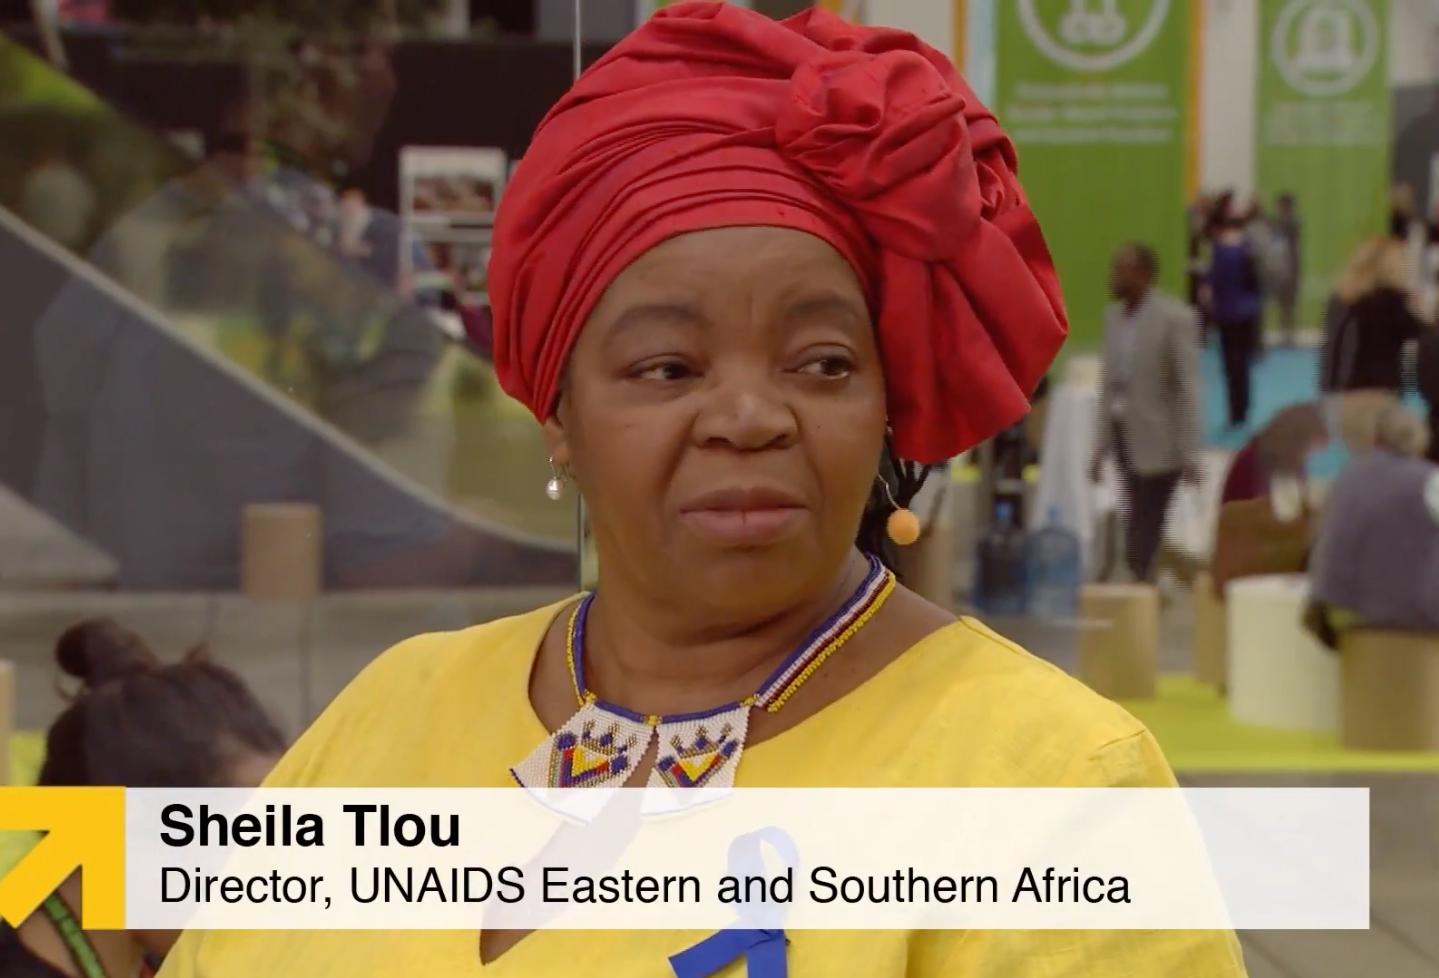 Sheila Tlou, UNAIDS